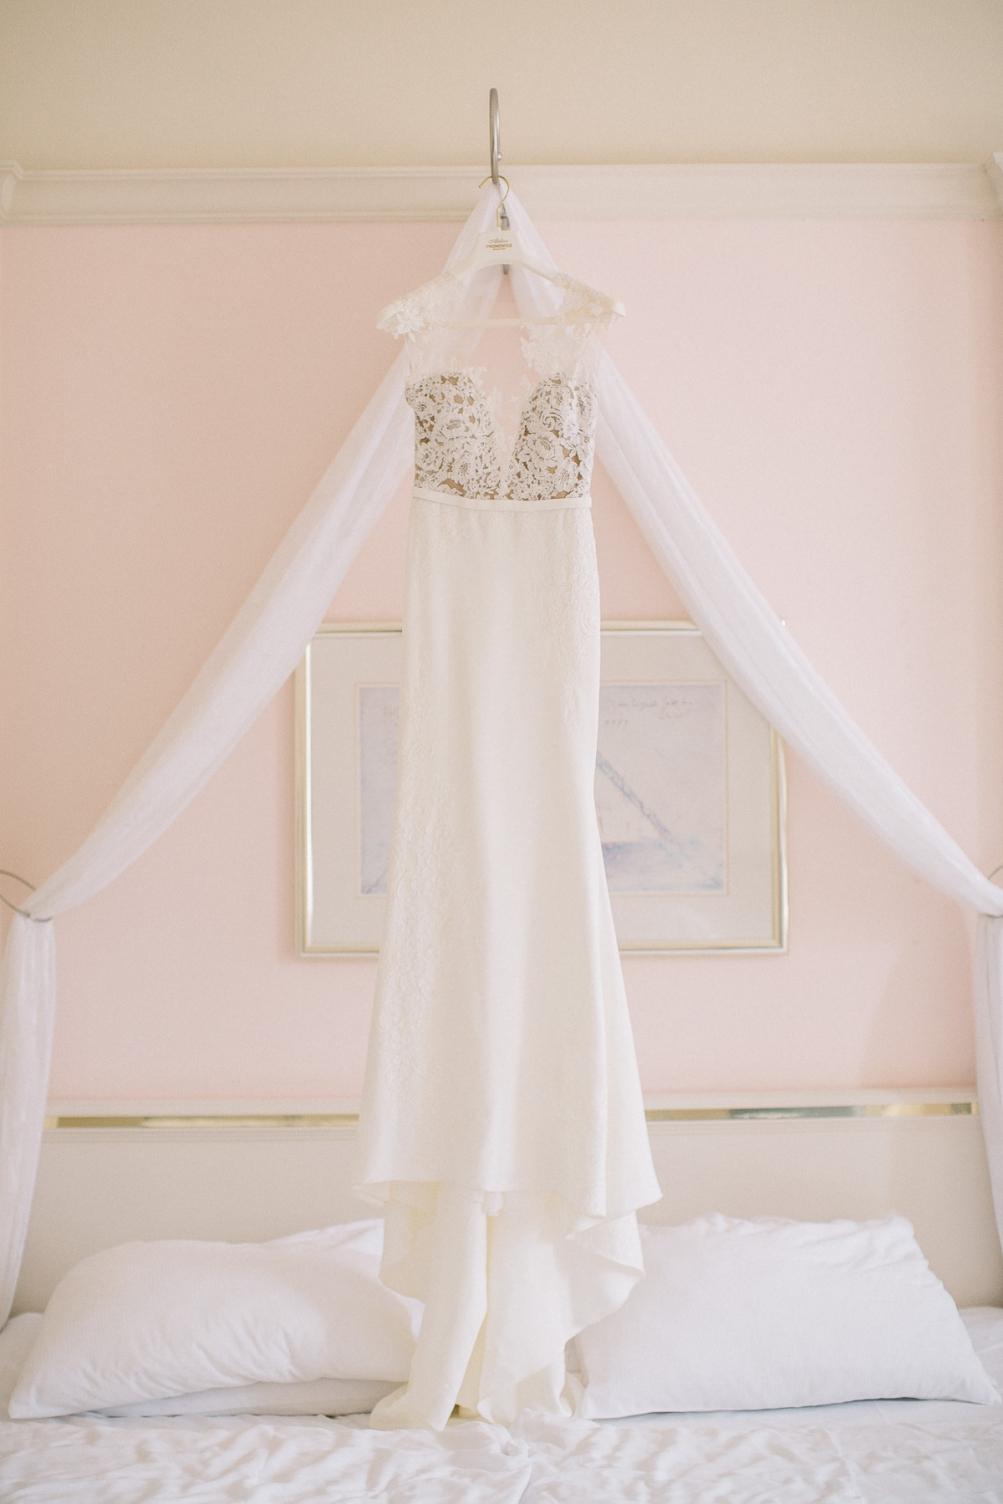 marie-huw-bamberg-germany-wedding-016